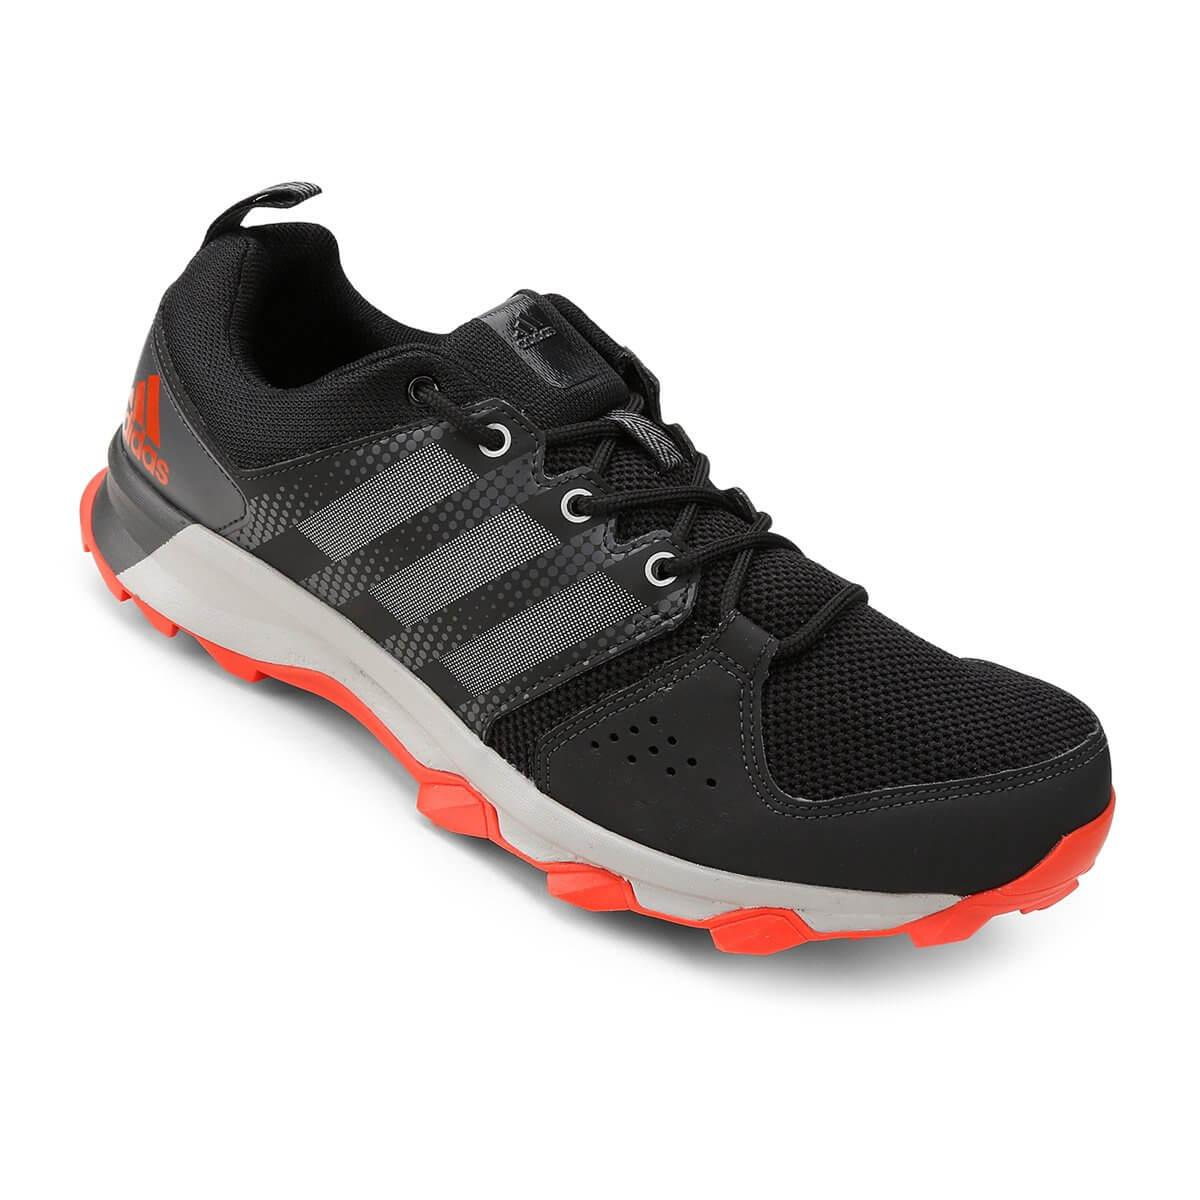 042e8207db5ad Tênis Adidas Galaxy Trail Masculino - Decker Online!